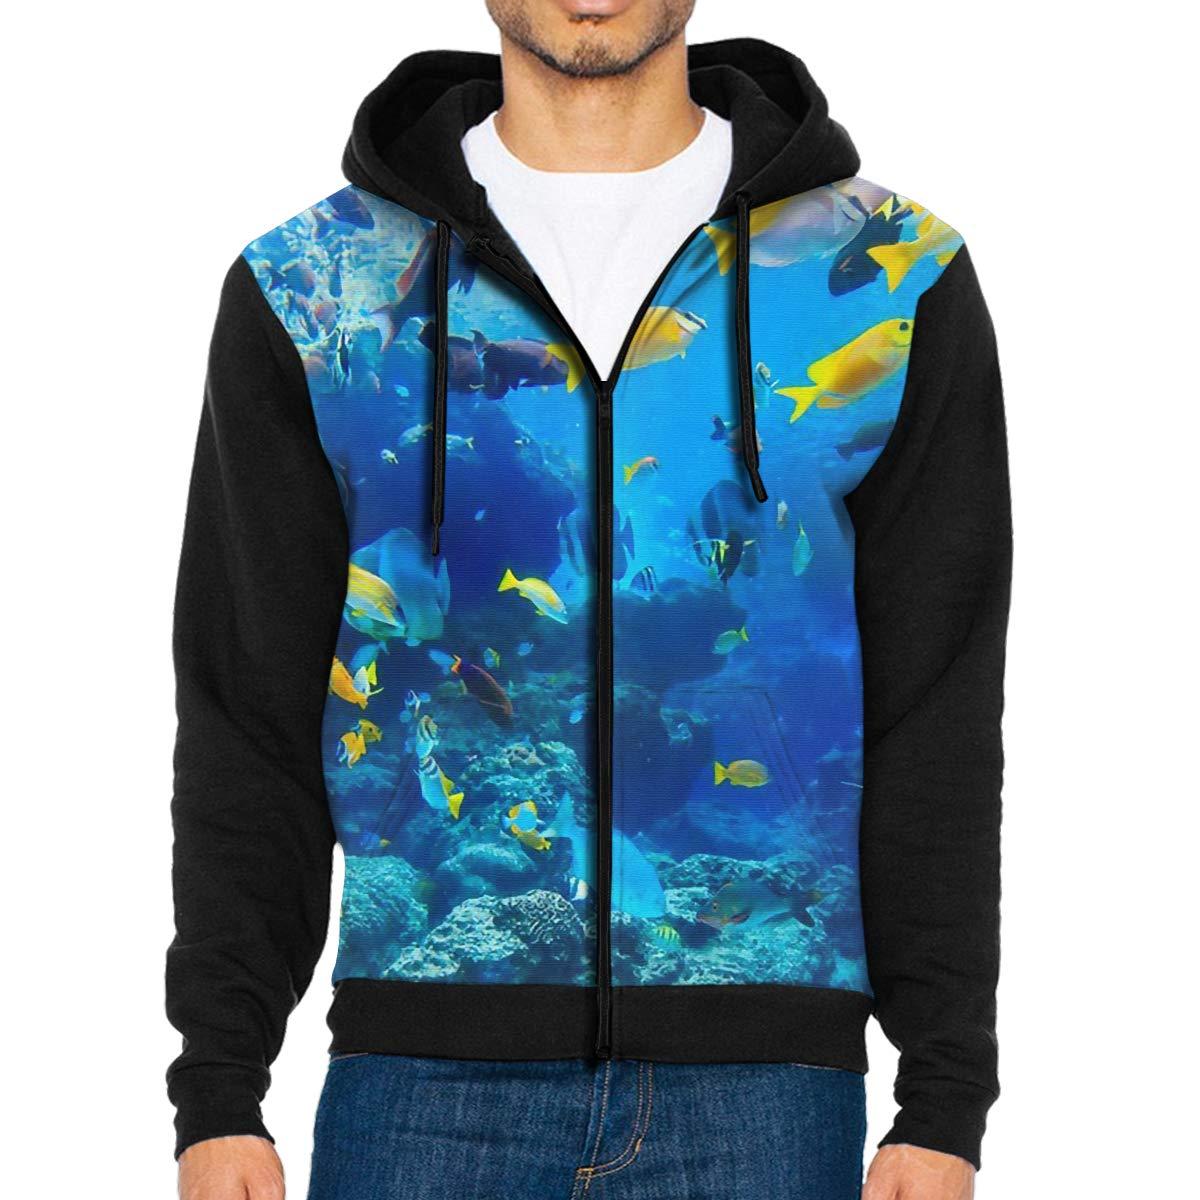 f4066a33 Amazon.com: LEATHERS Man's Casual Garb Hoodies Blue Coral Zipper Hoodie Men  Sweatshirt: Clothing